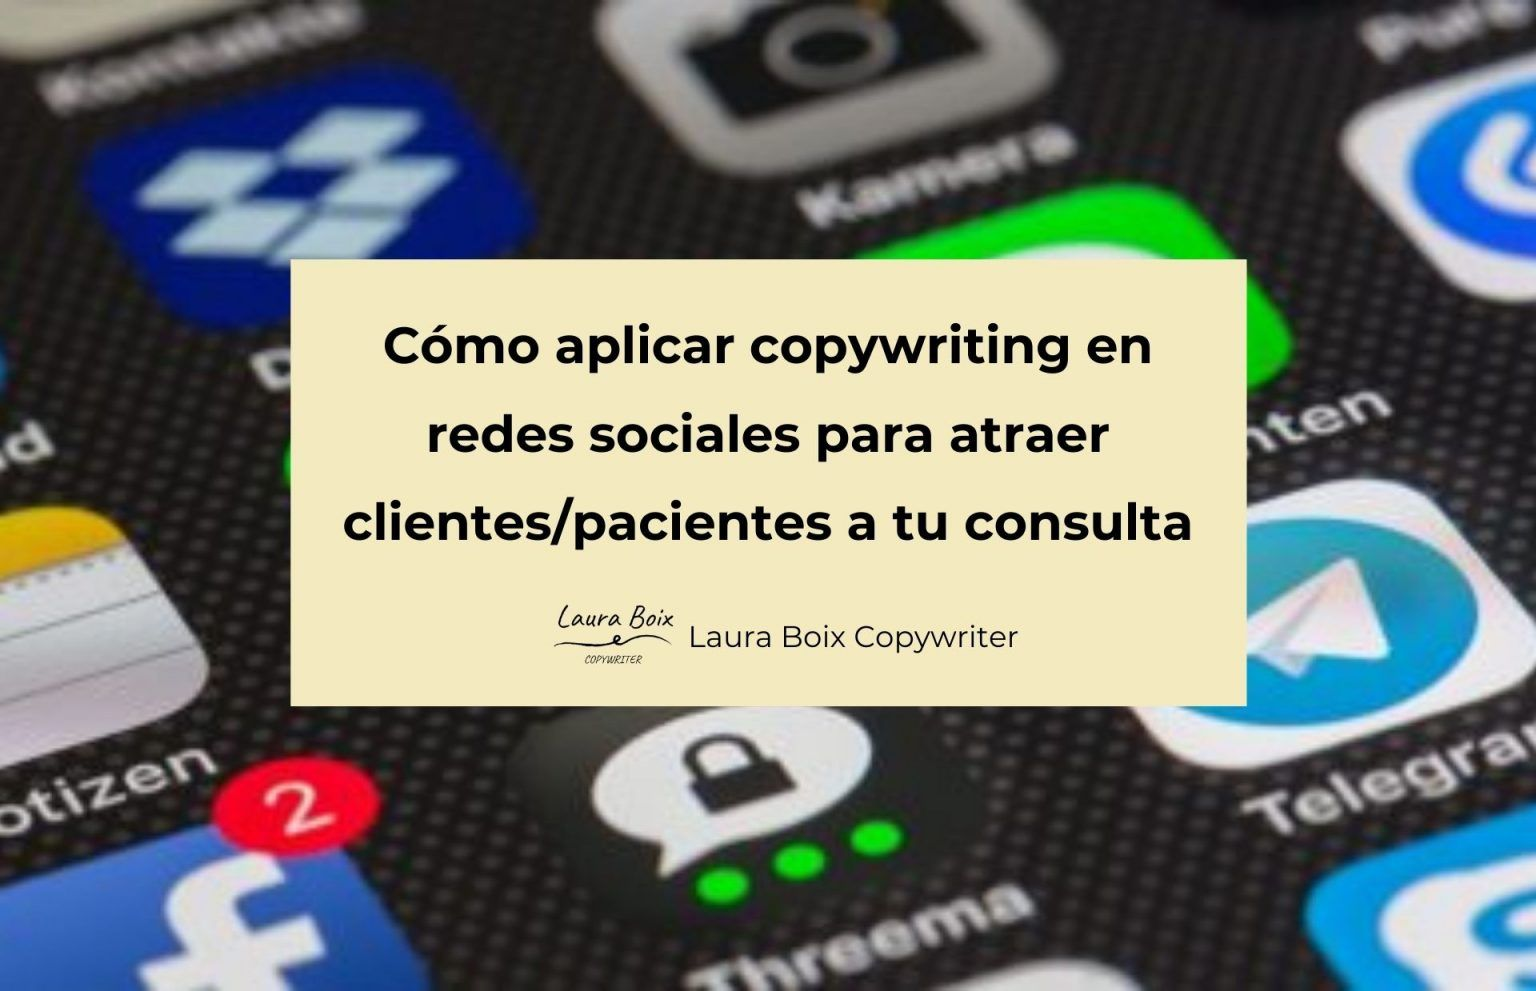 aplicar-copywriting-en-redes-sociales-para-atraer-pacientes-clientes-a-tu-consulta